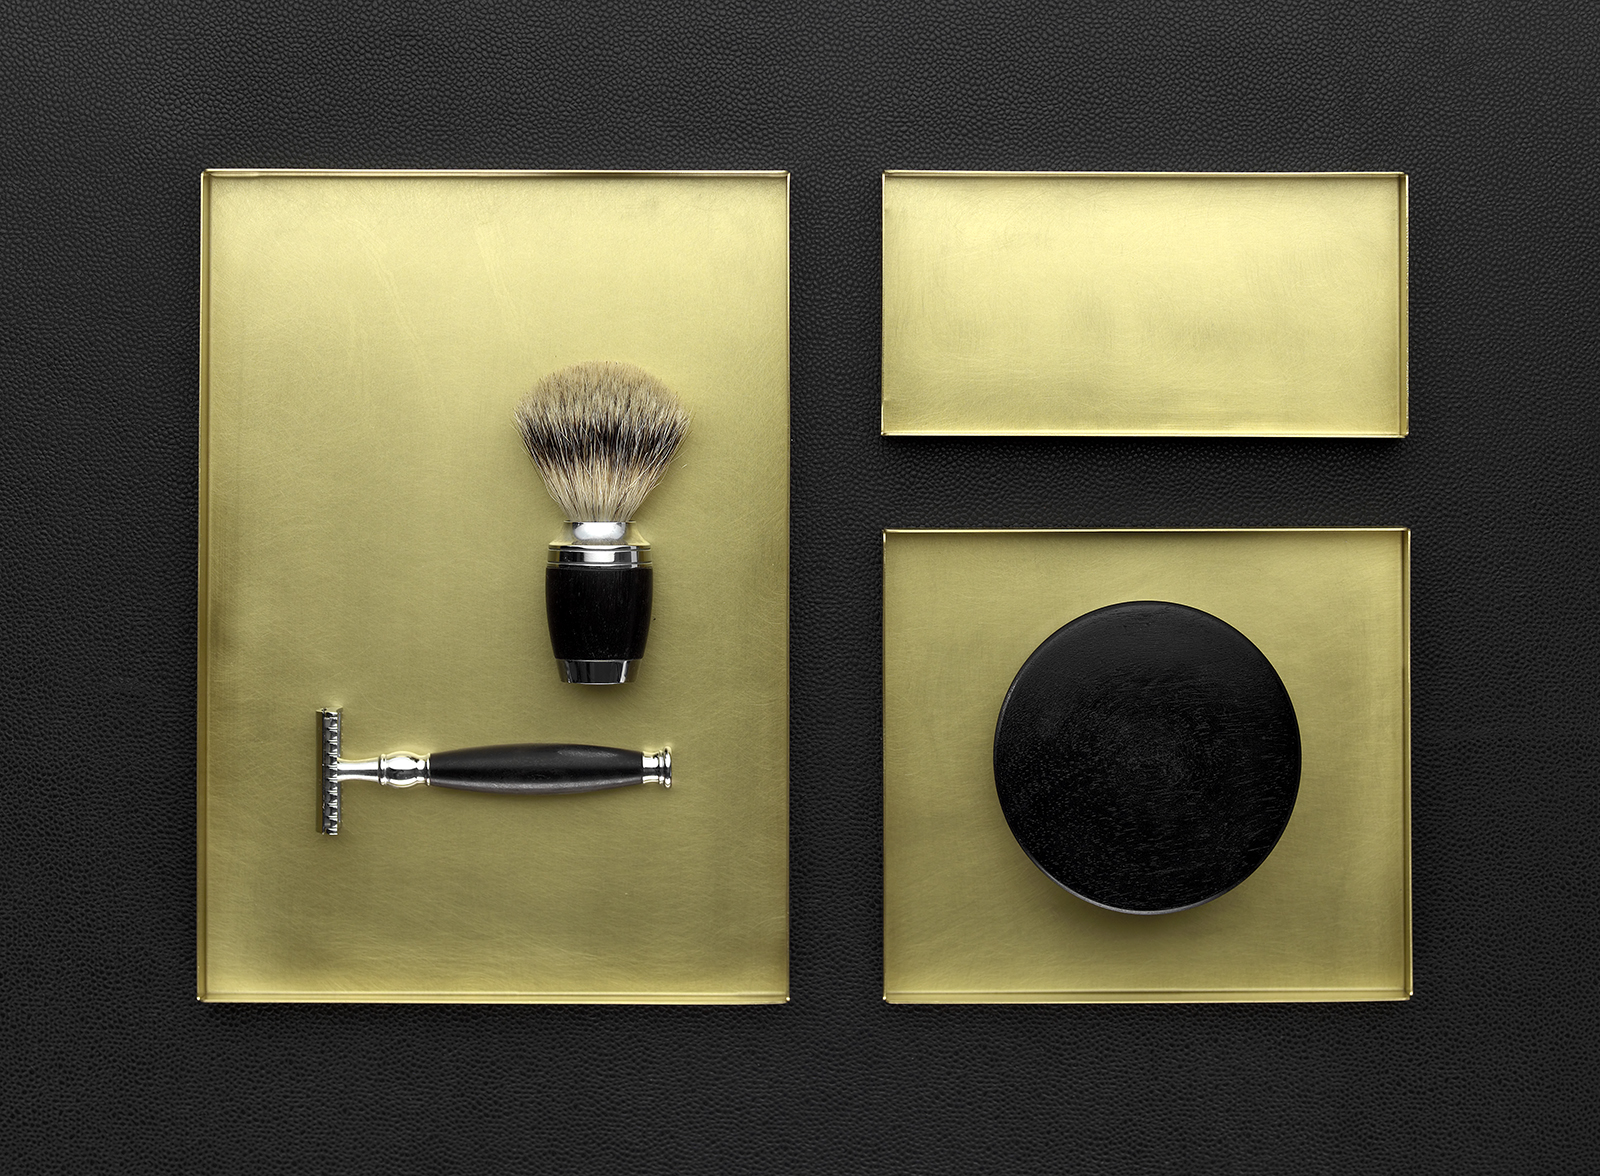 Fotograf Werbefotografie Studio Oberfranken juno_tablets ismael conde ruiz silversmith